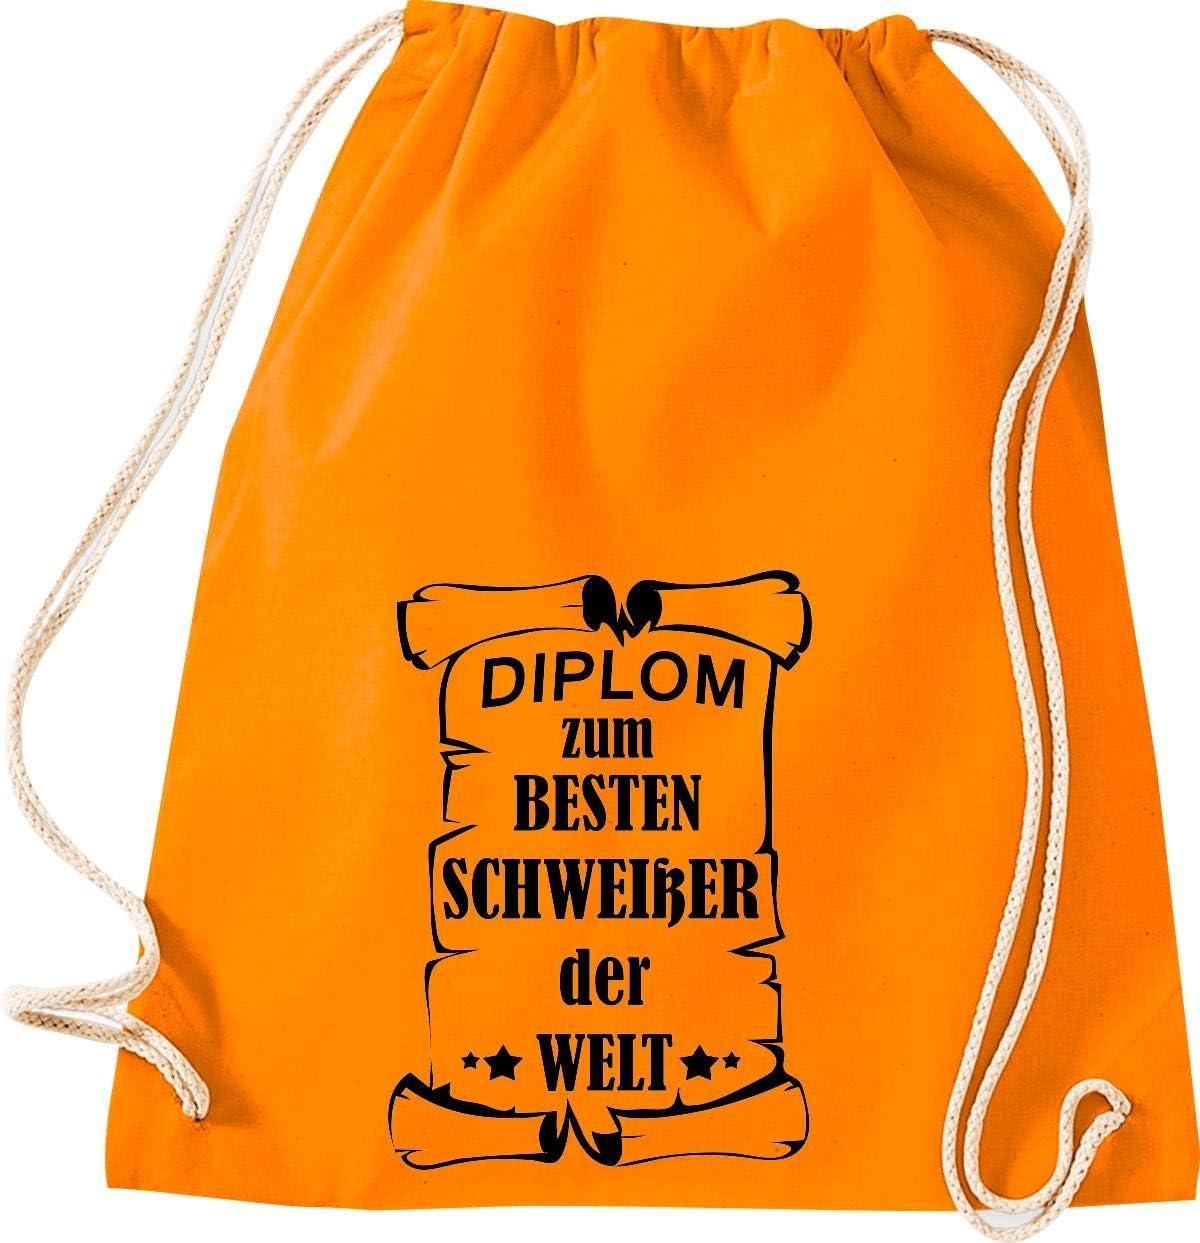 Camiseta stown Turn Bolsa Diploma el mejor del mundo soldar